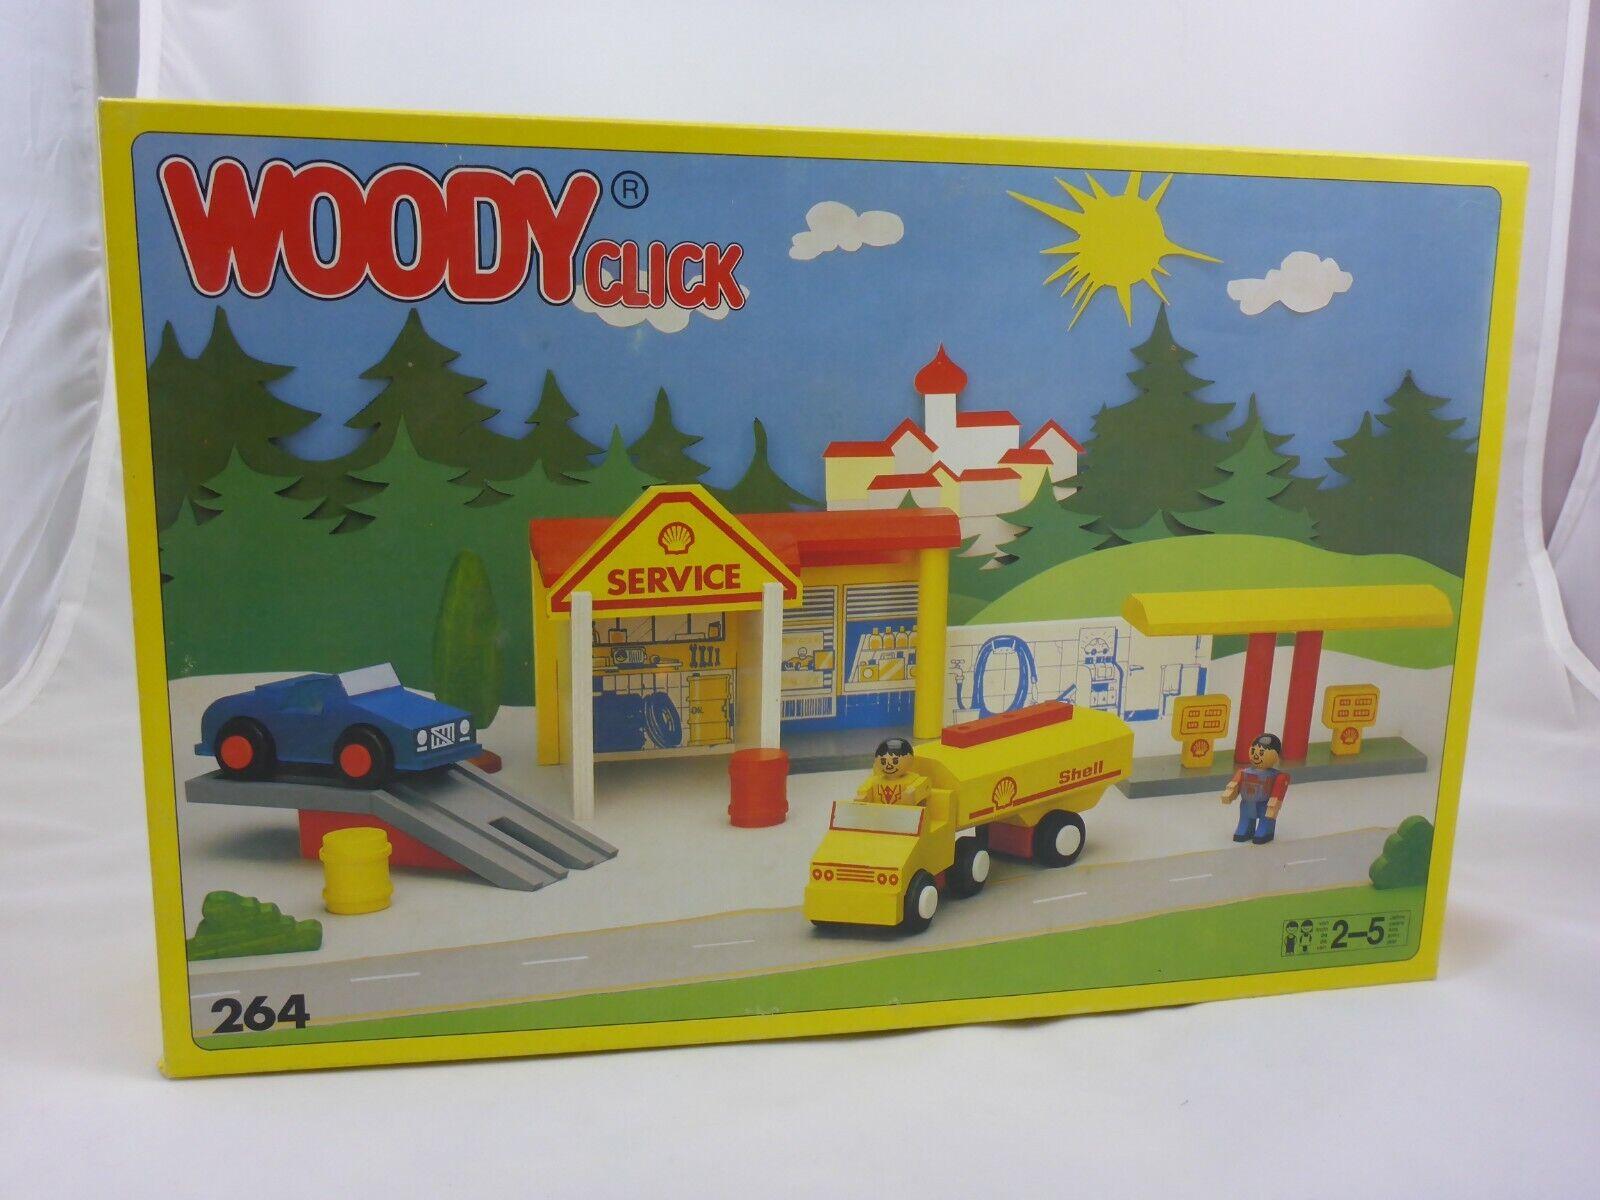 Matador Woody Click 264 Tankstelle Holzbaukasten - Retro - ab 2-5 Jahre